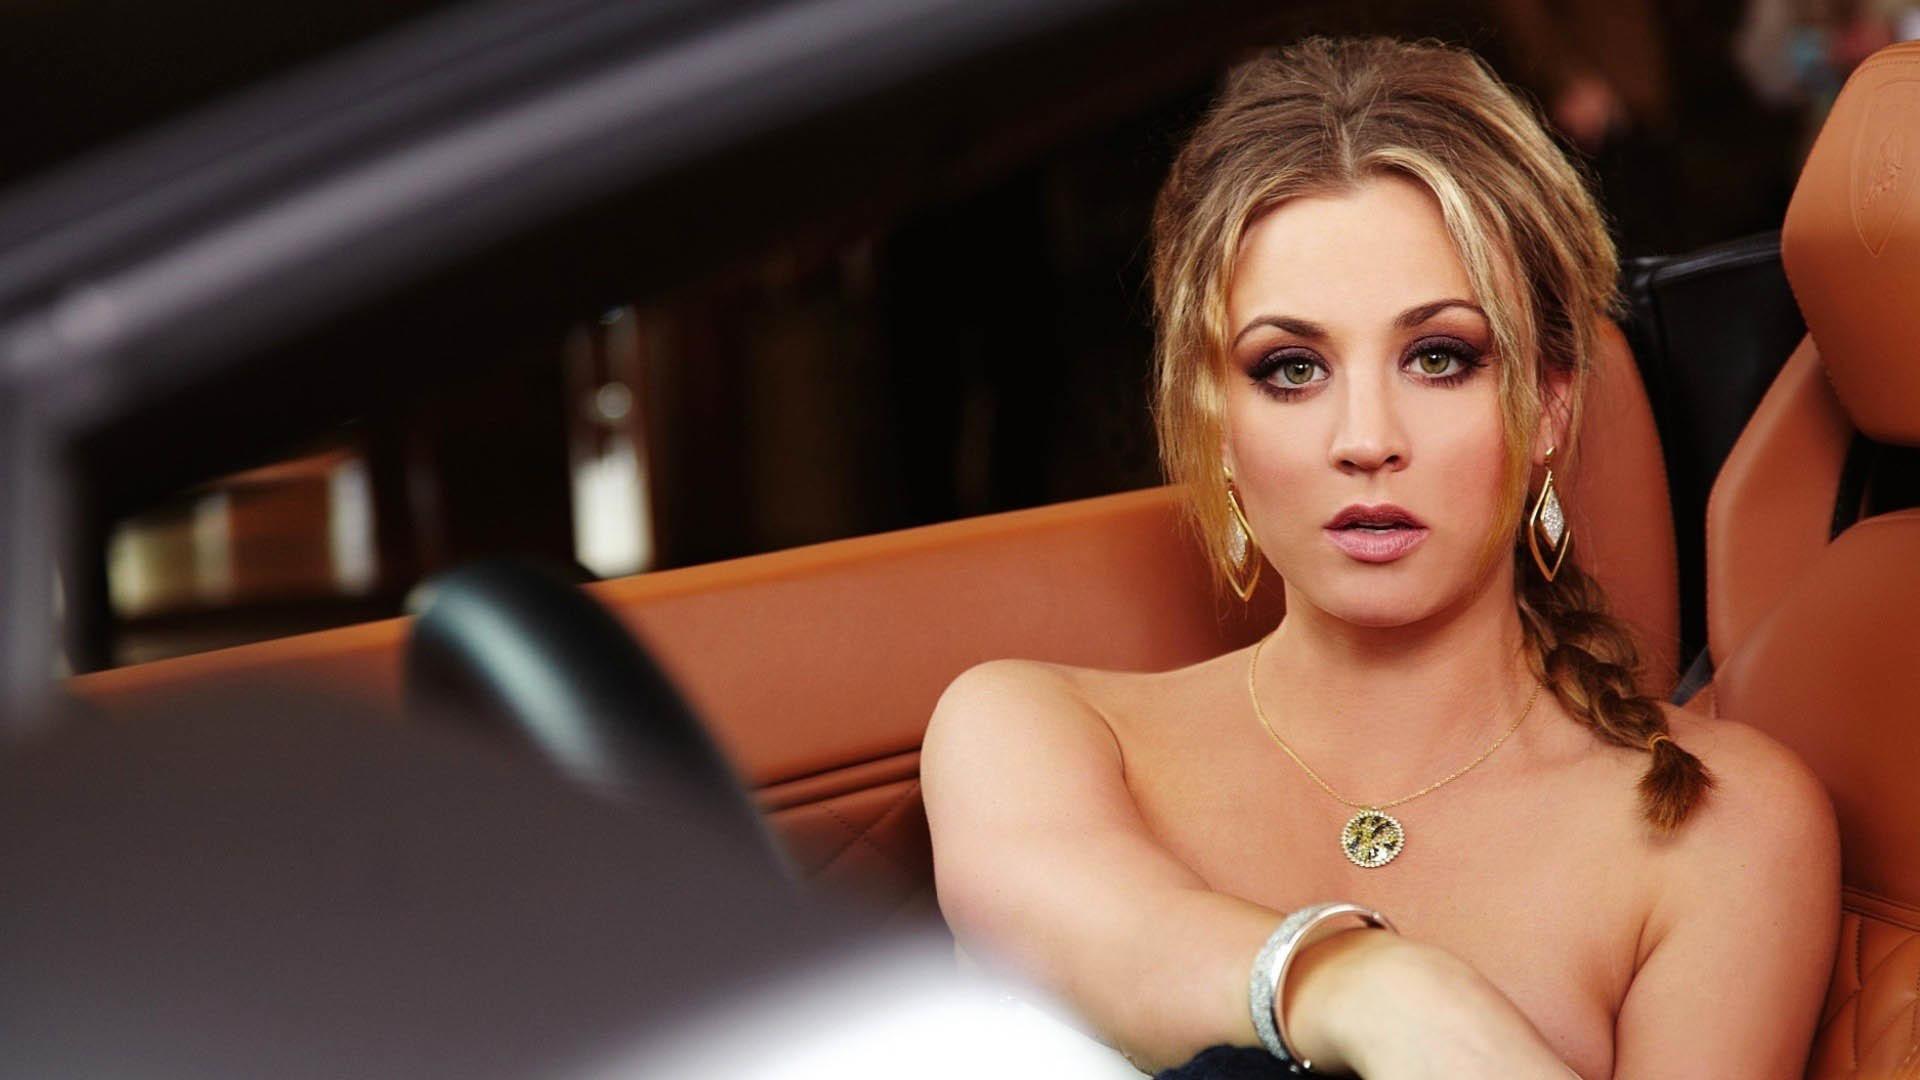 Kaley Cuoco-Sweeting posing in a Lamborghini wallpaper